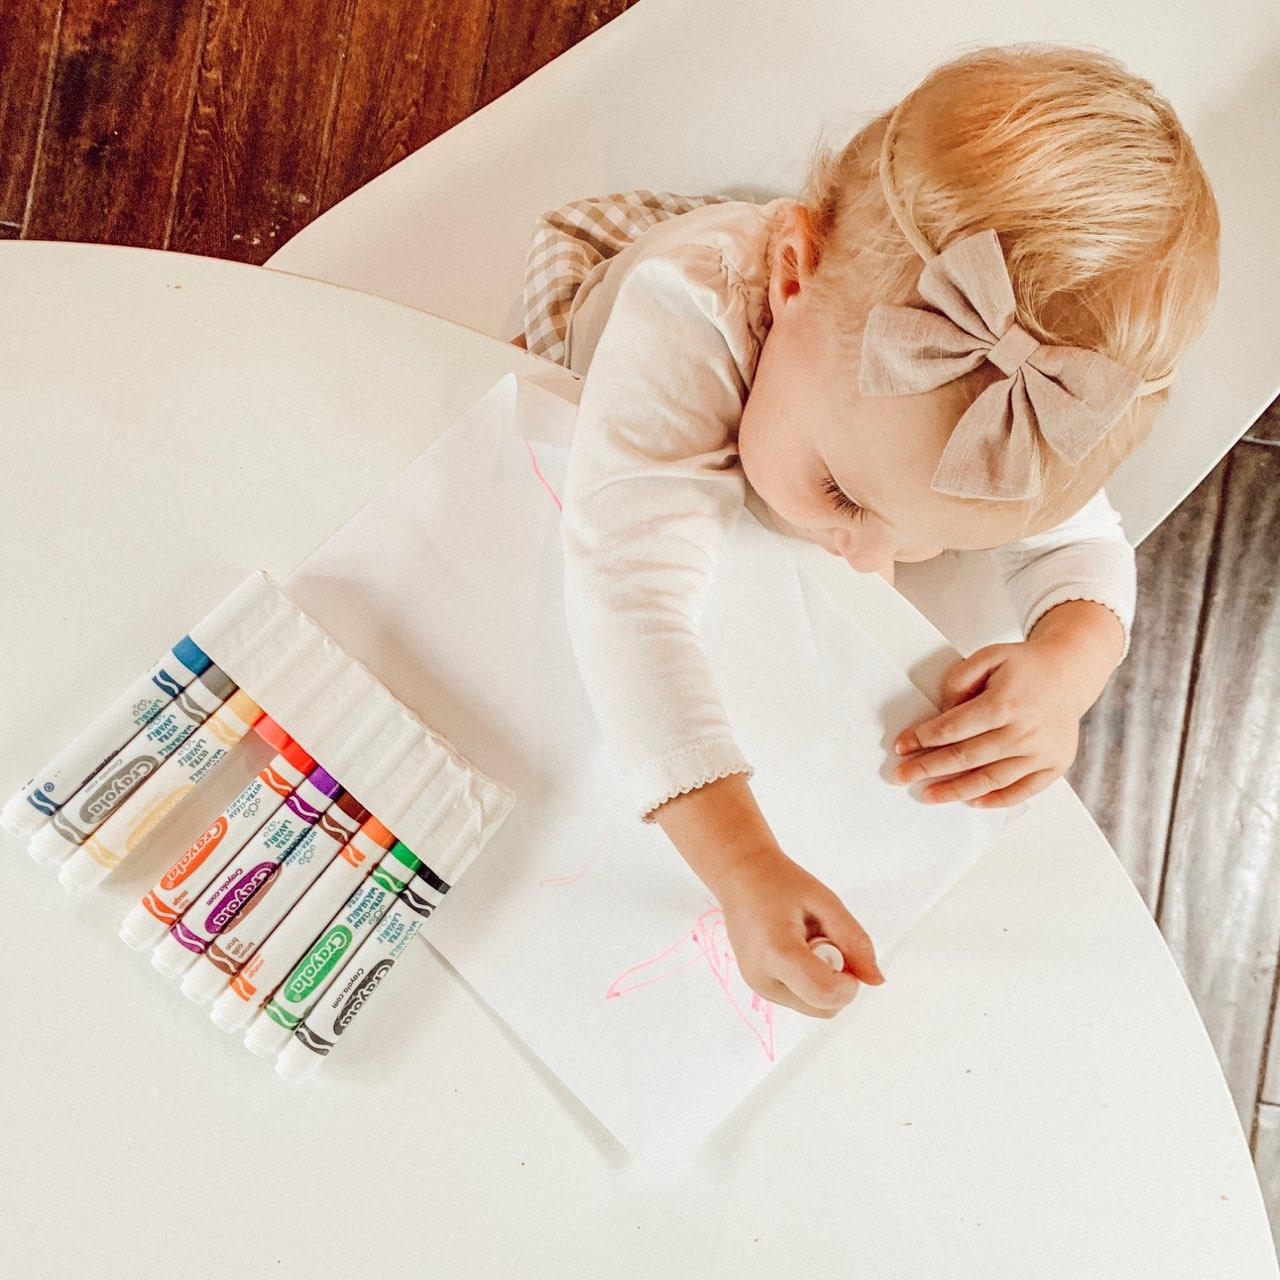 toddler girl coloring